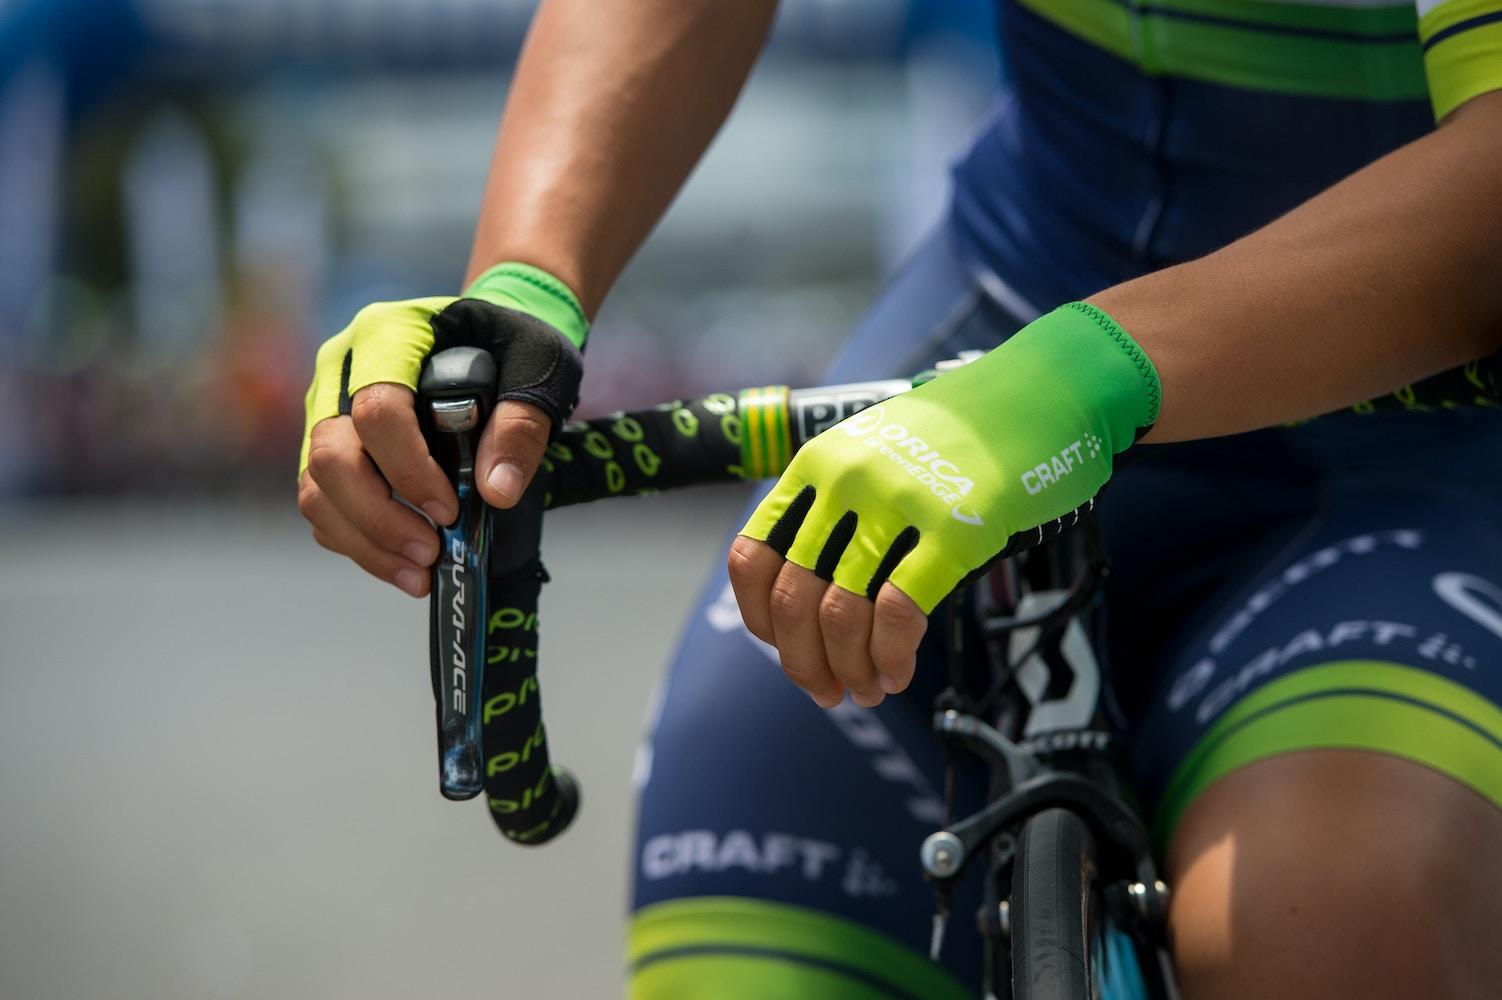 Shimano at the Tour de France